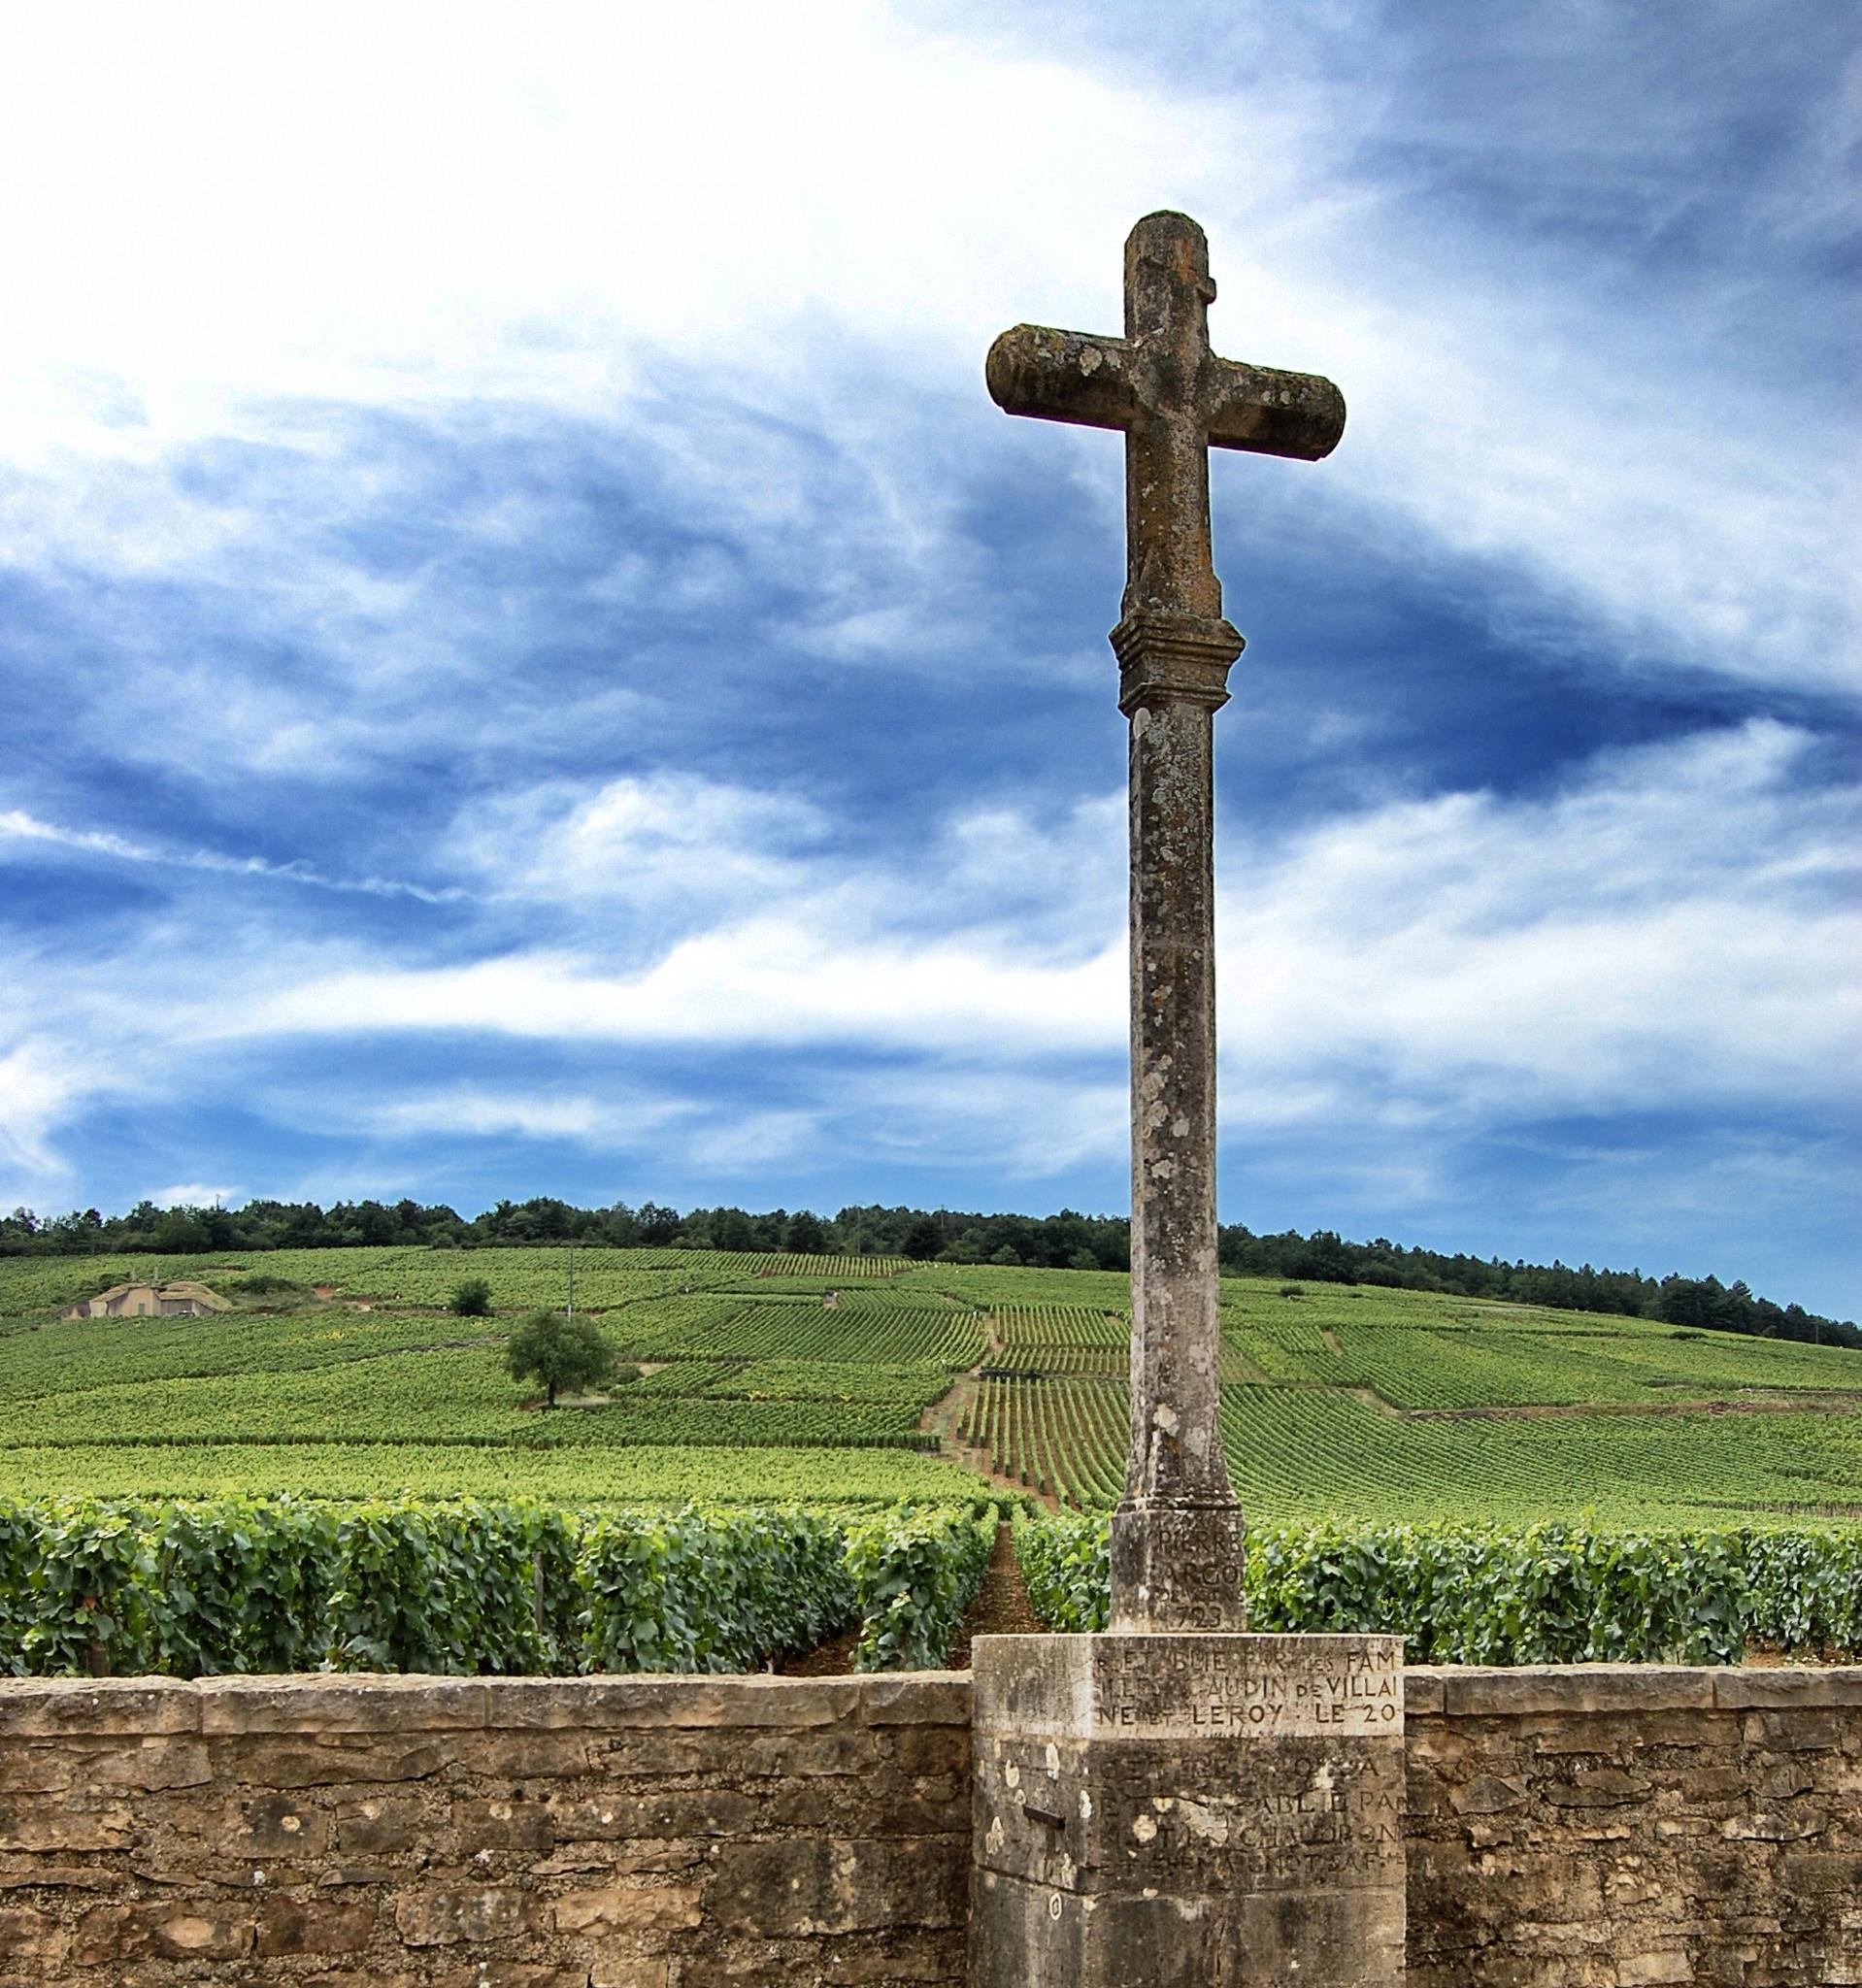 Domaine-romanee-conti-vineyard.jpg